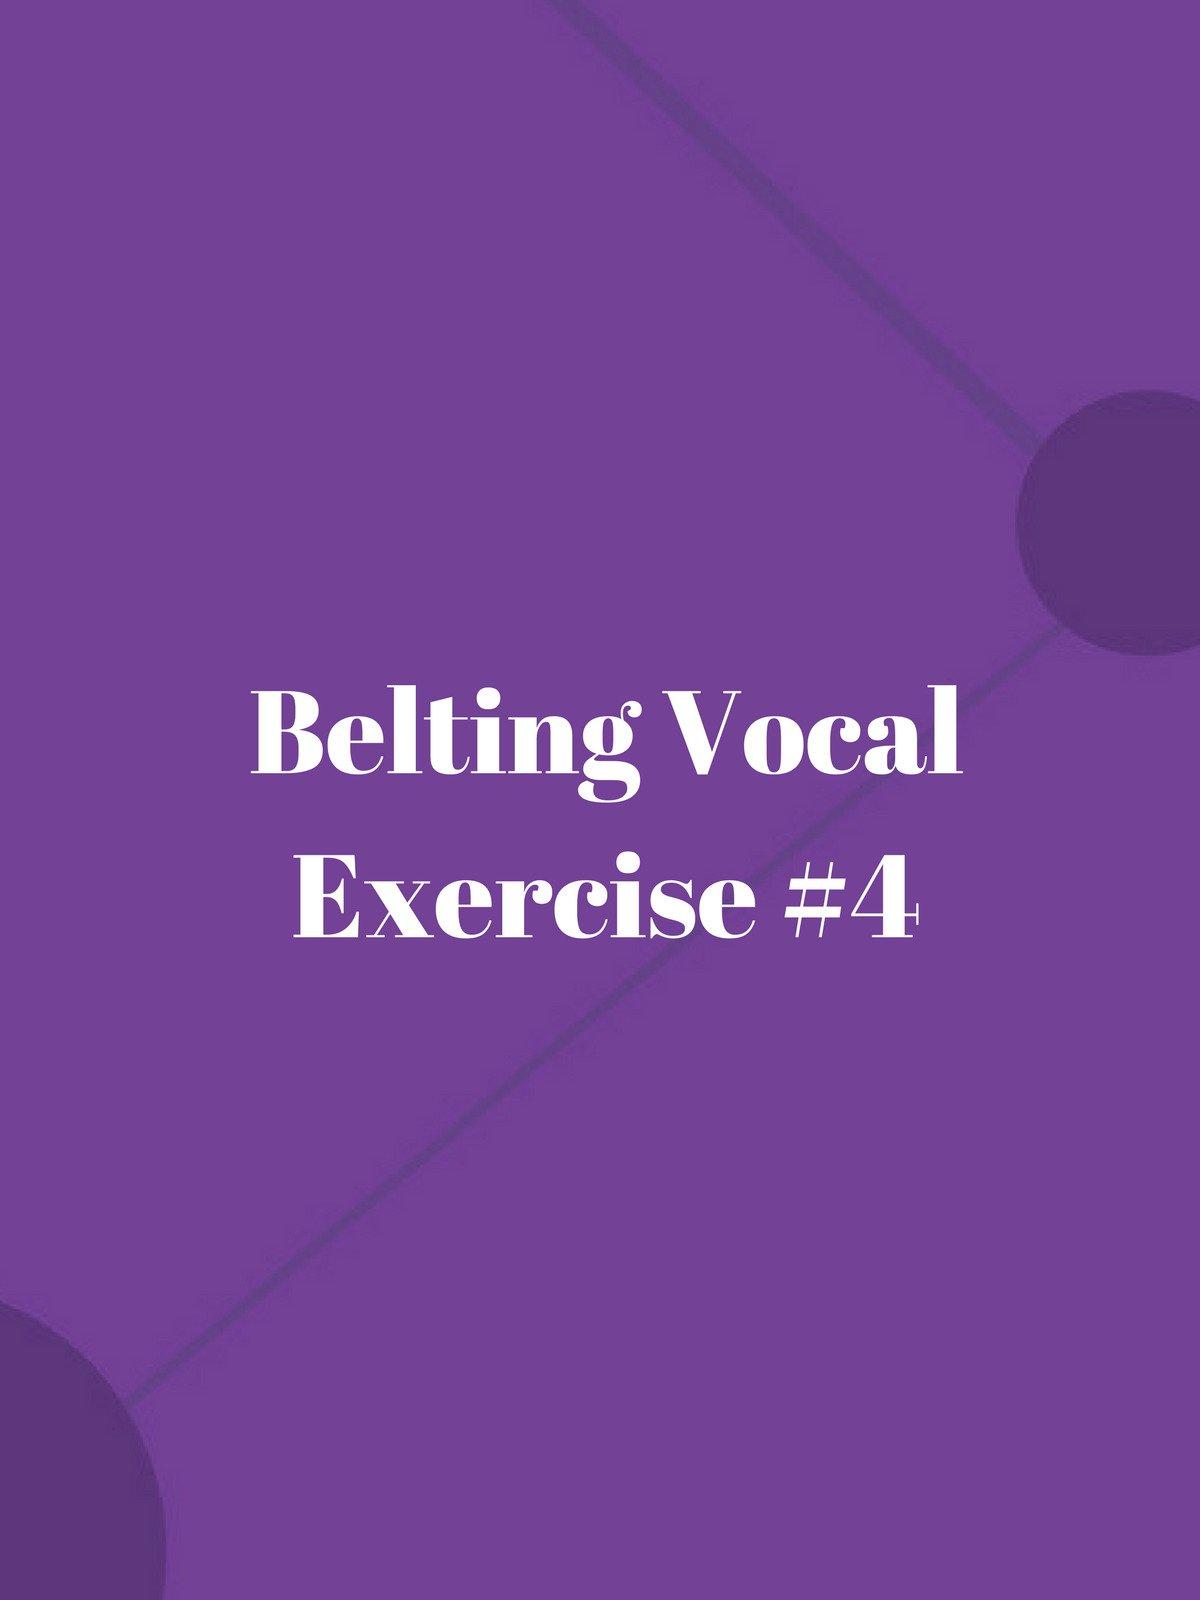 Belting Vocal Exercise #4